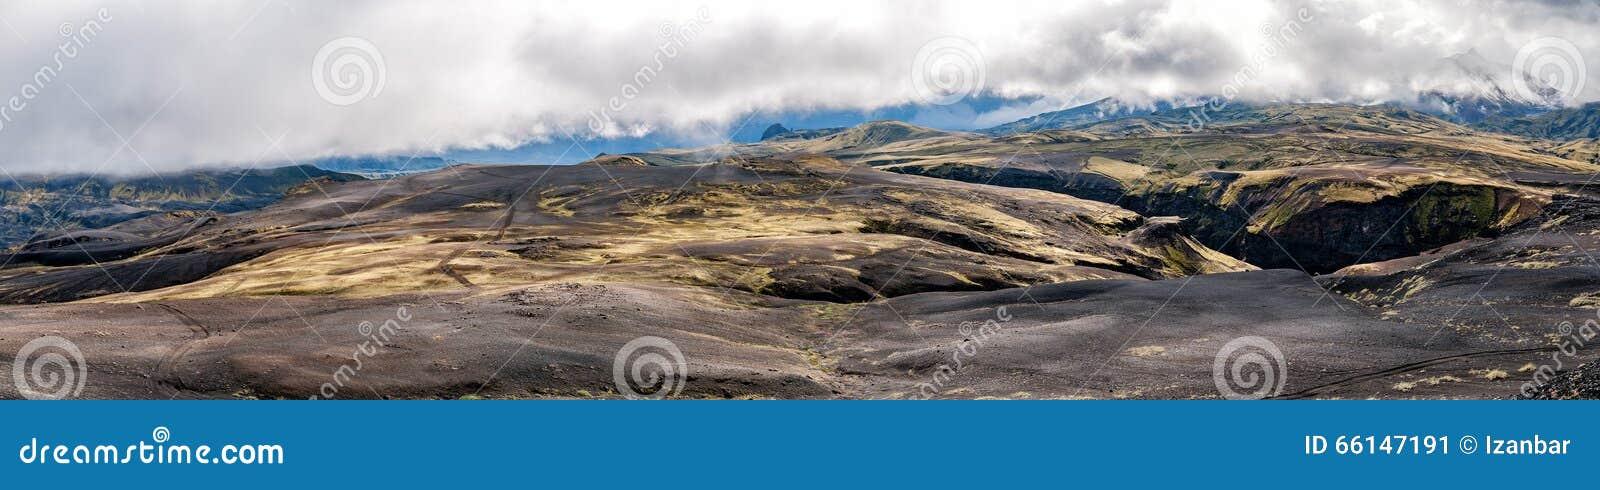 Paysage sauvage de voyage de l Islande Landmannalaugar